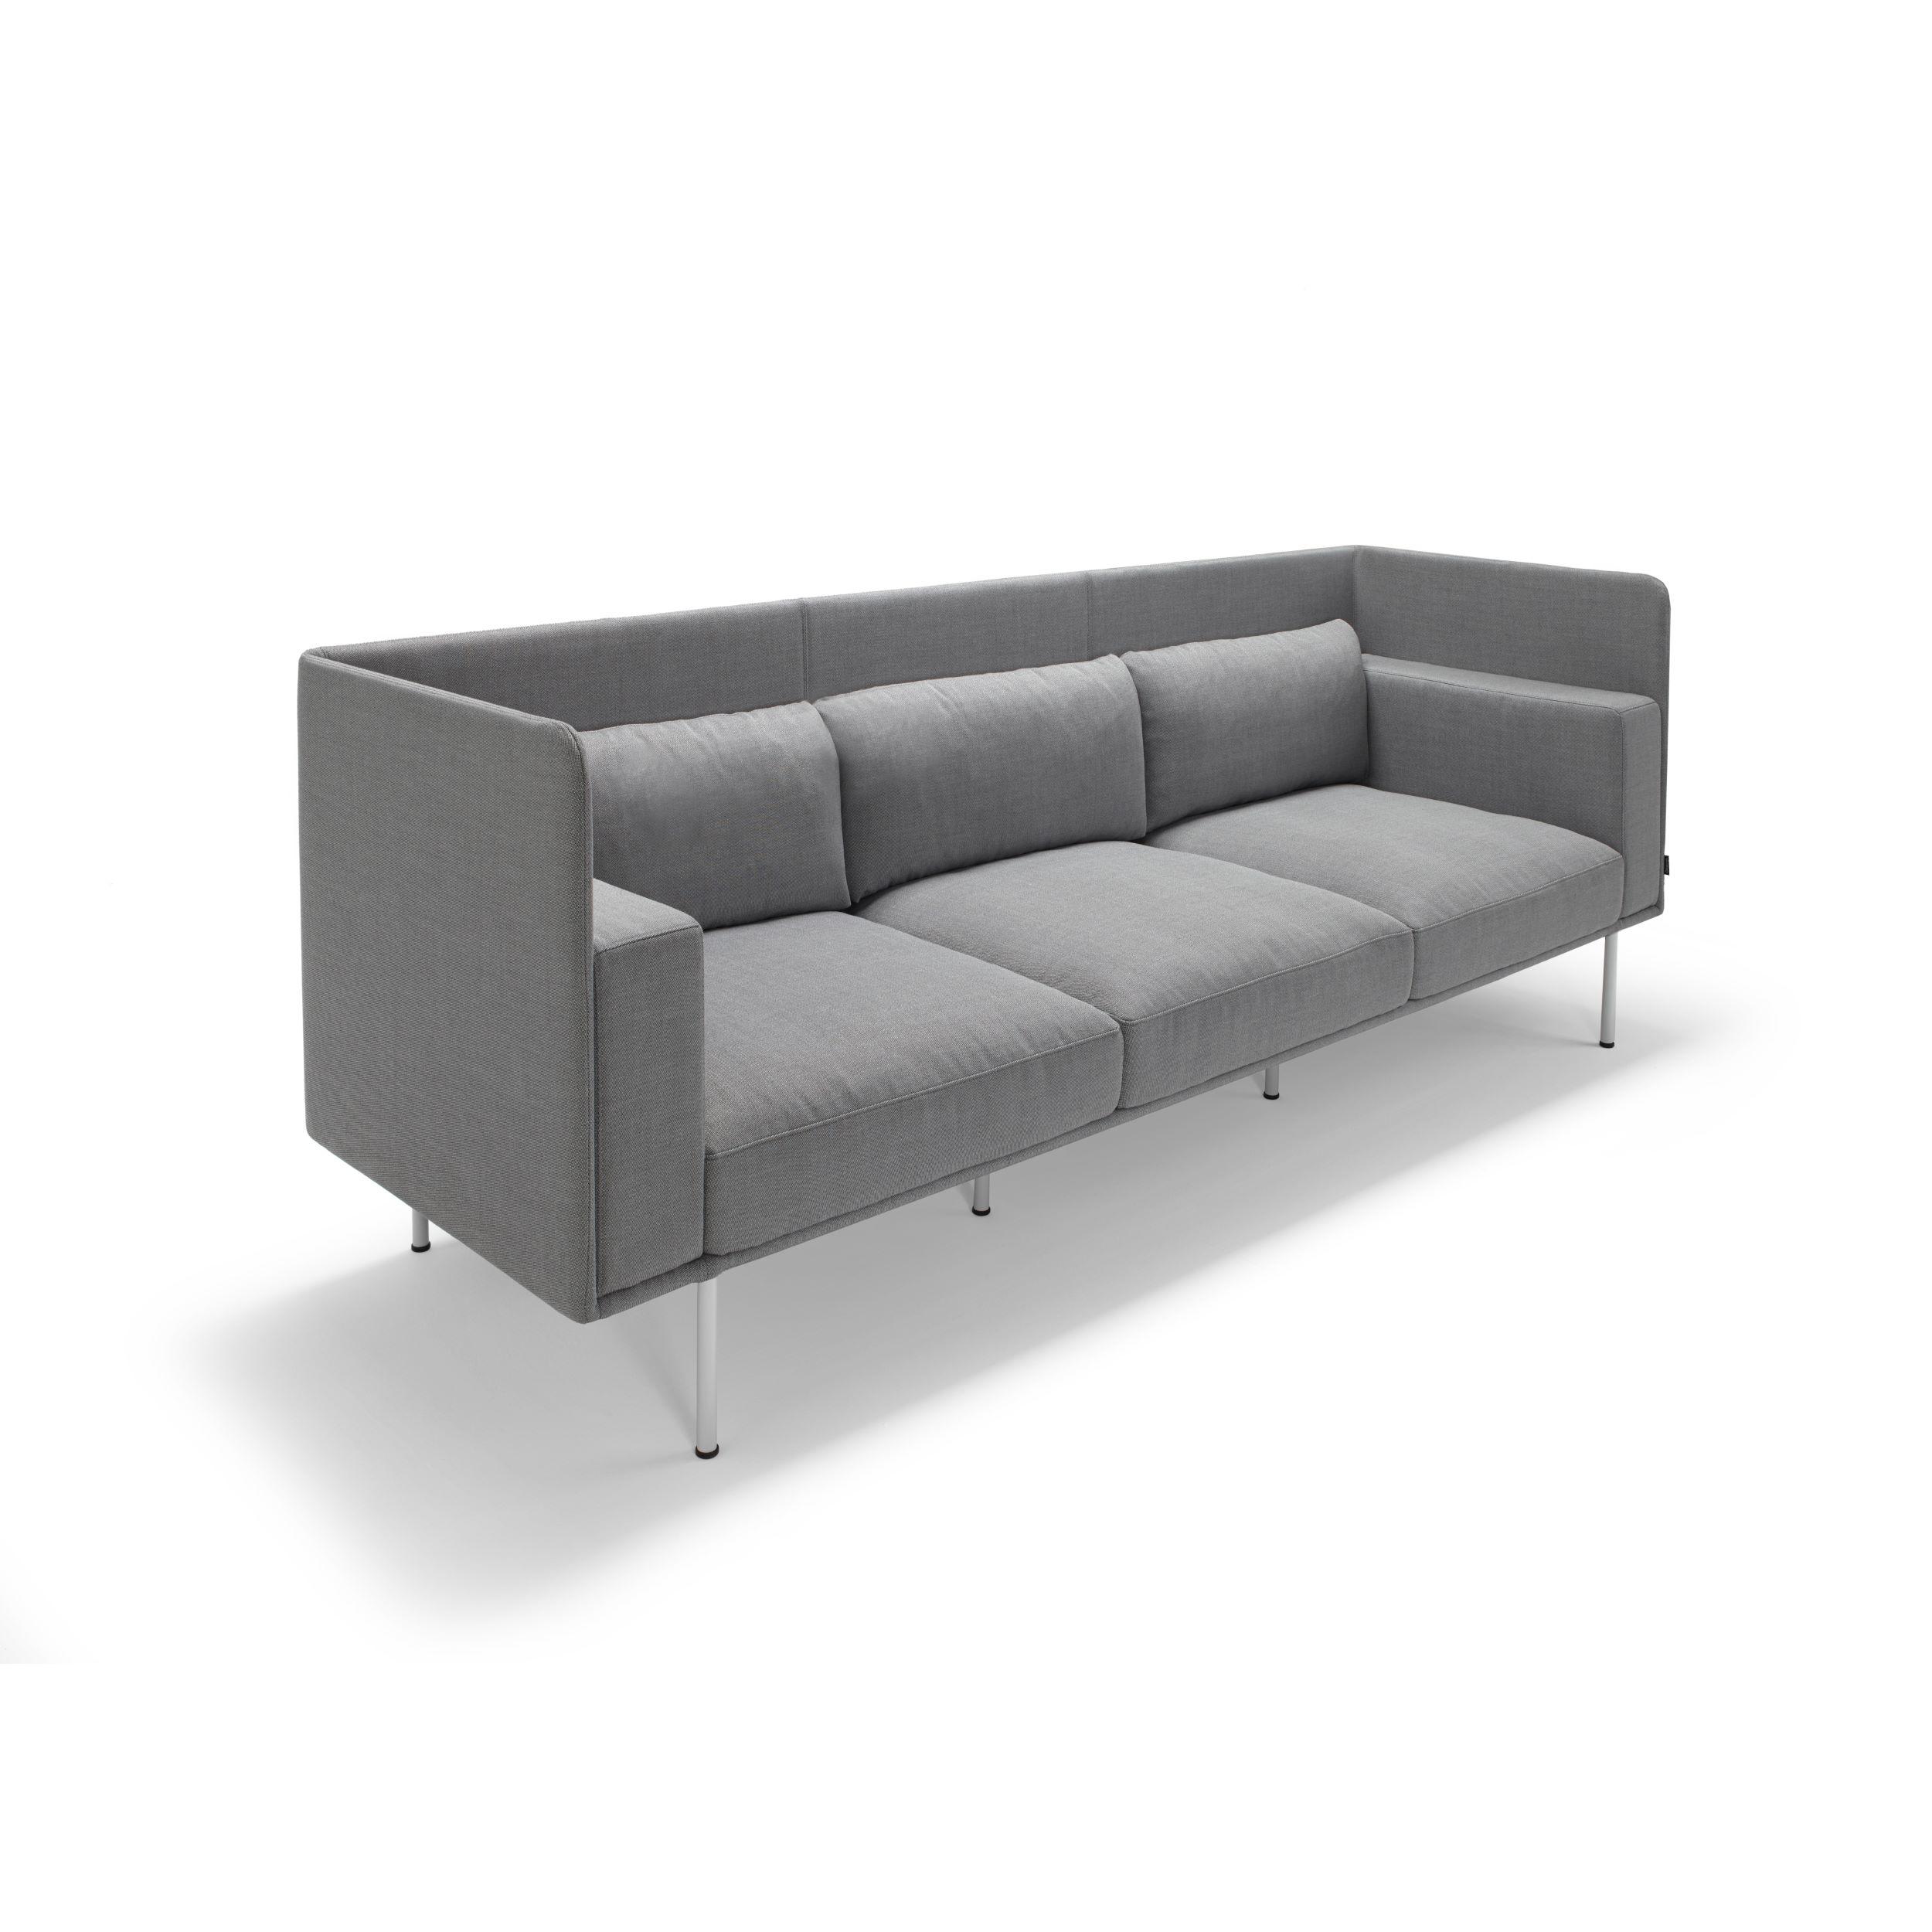 Varilounge High Sofa System Offecct - High sofa